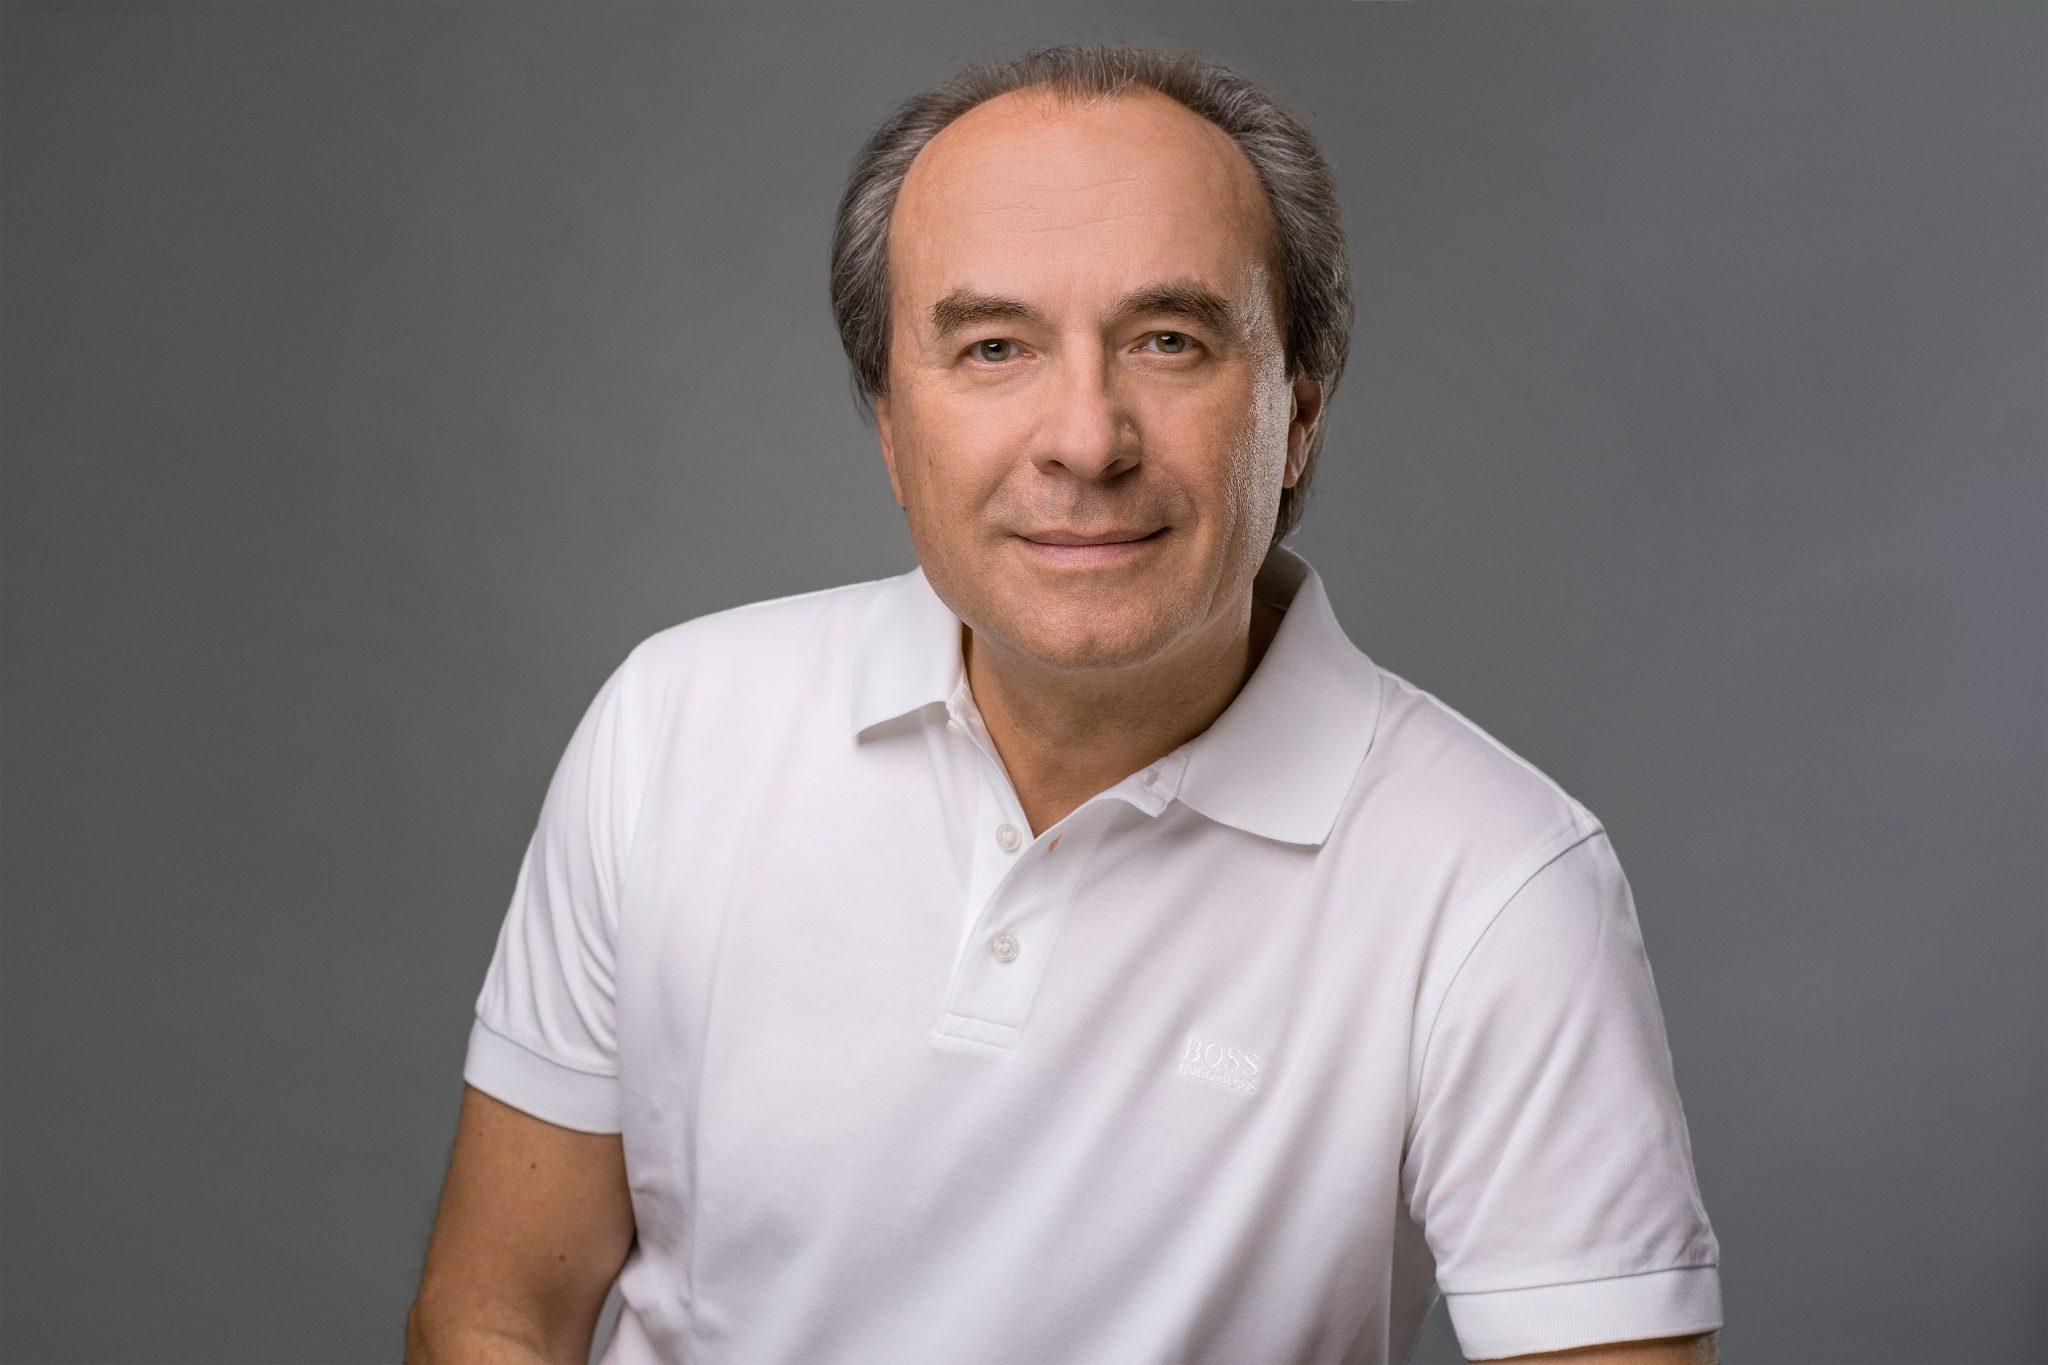 Dr. Andreas Binder